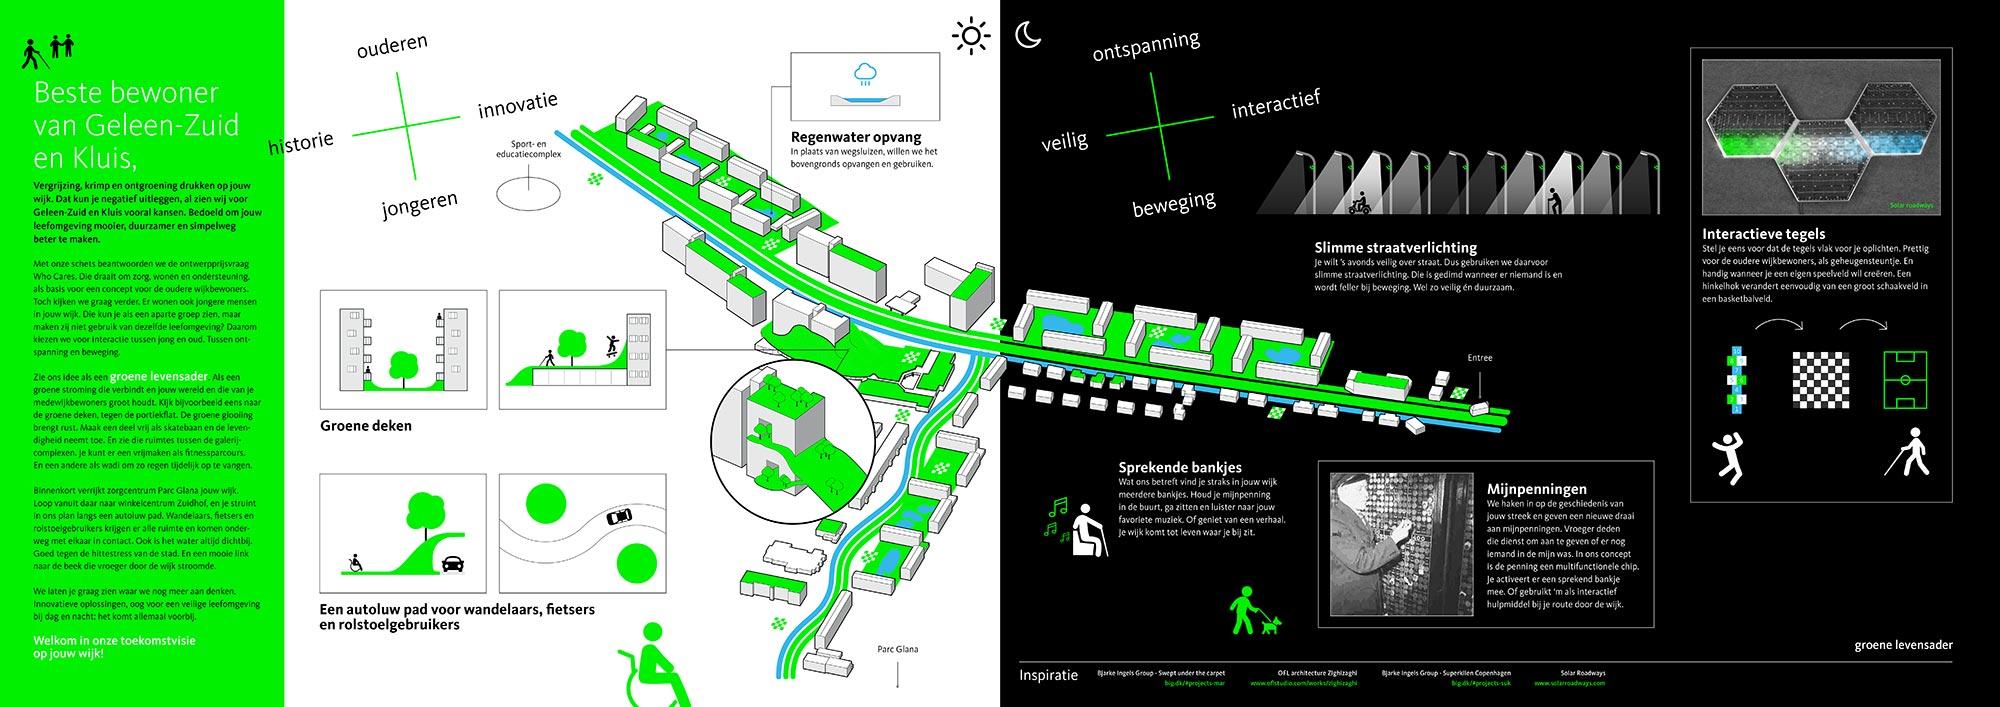 Who Cares inzending MCSI infographic ontwerp JAgd